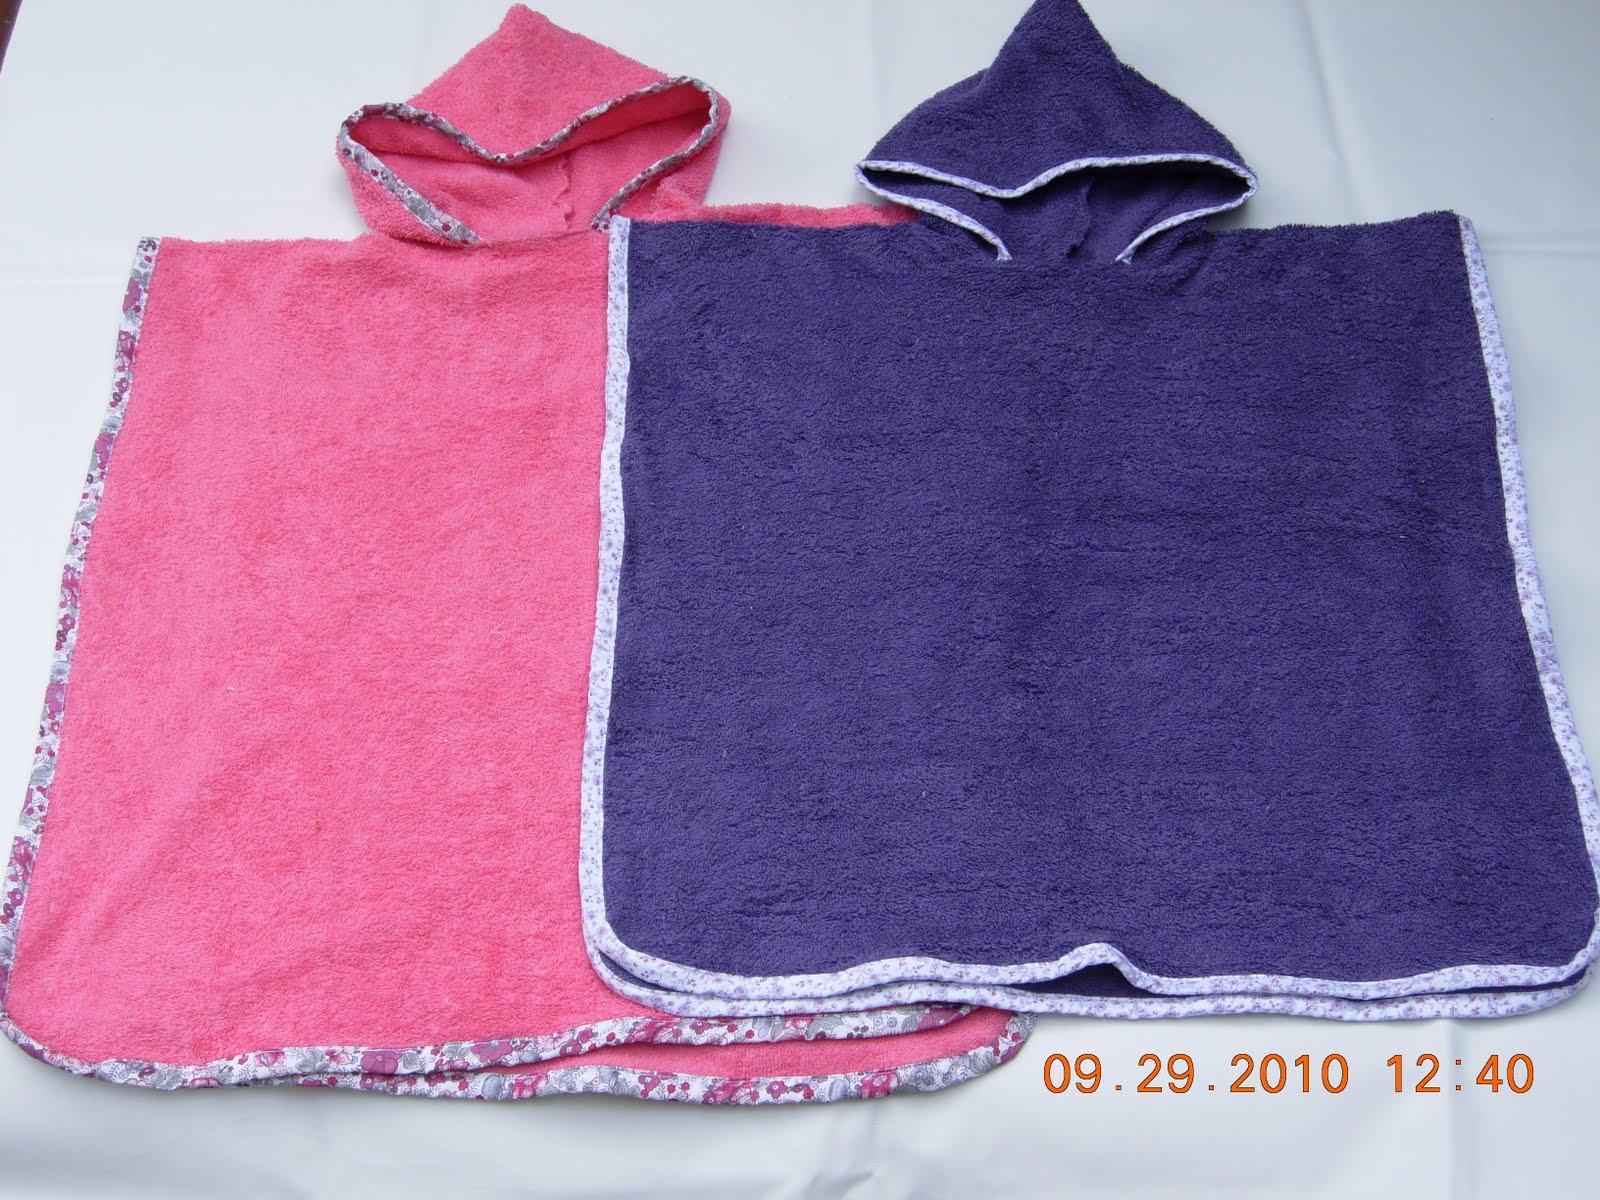 Poncho Baño Infantil:poncho y bata infantil para salir del mar o la pileta los ponchos